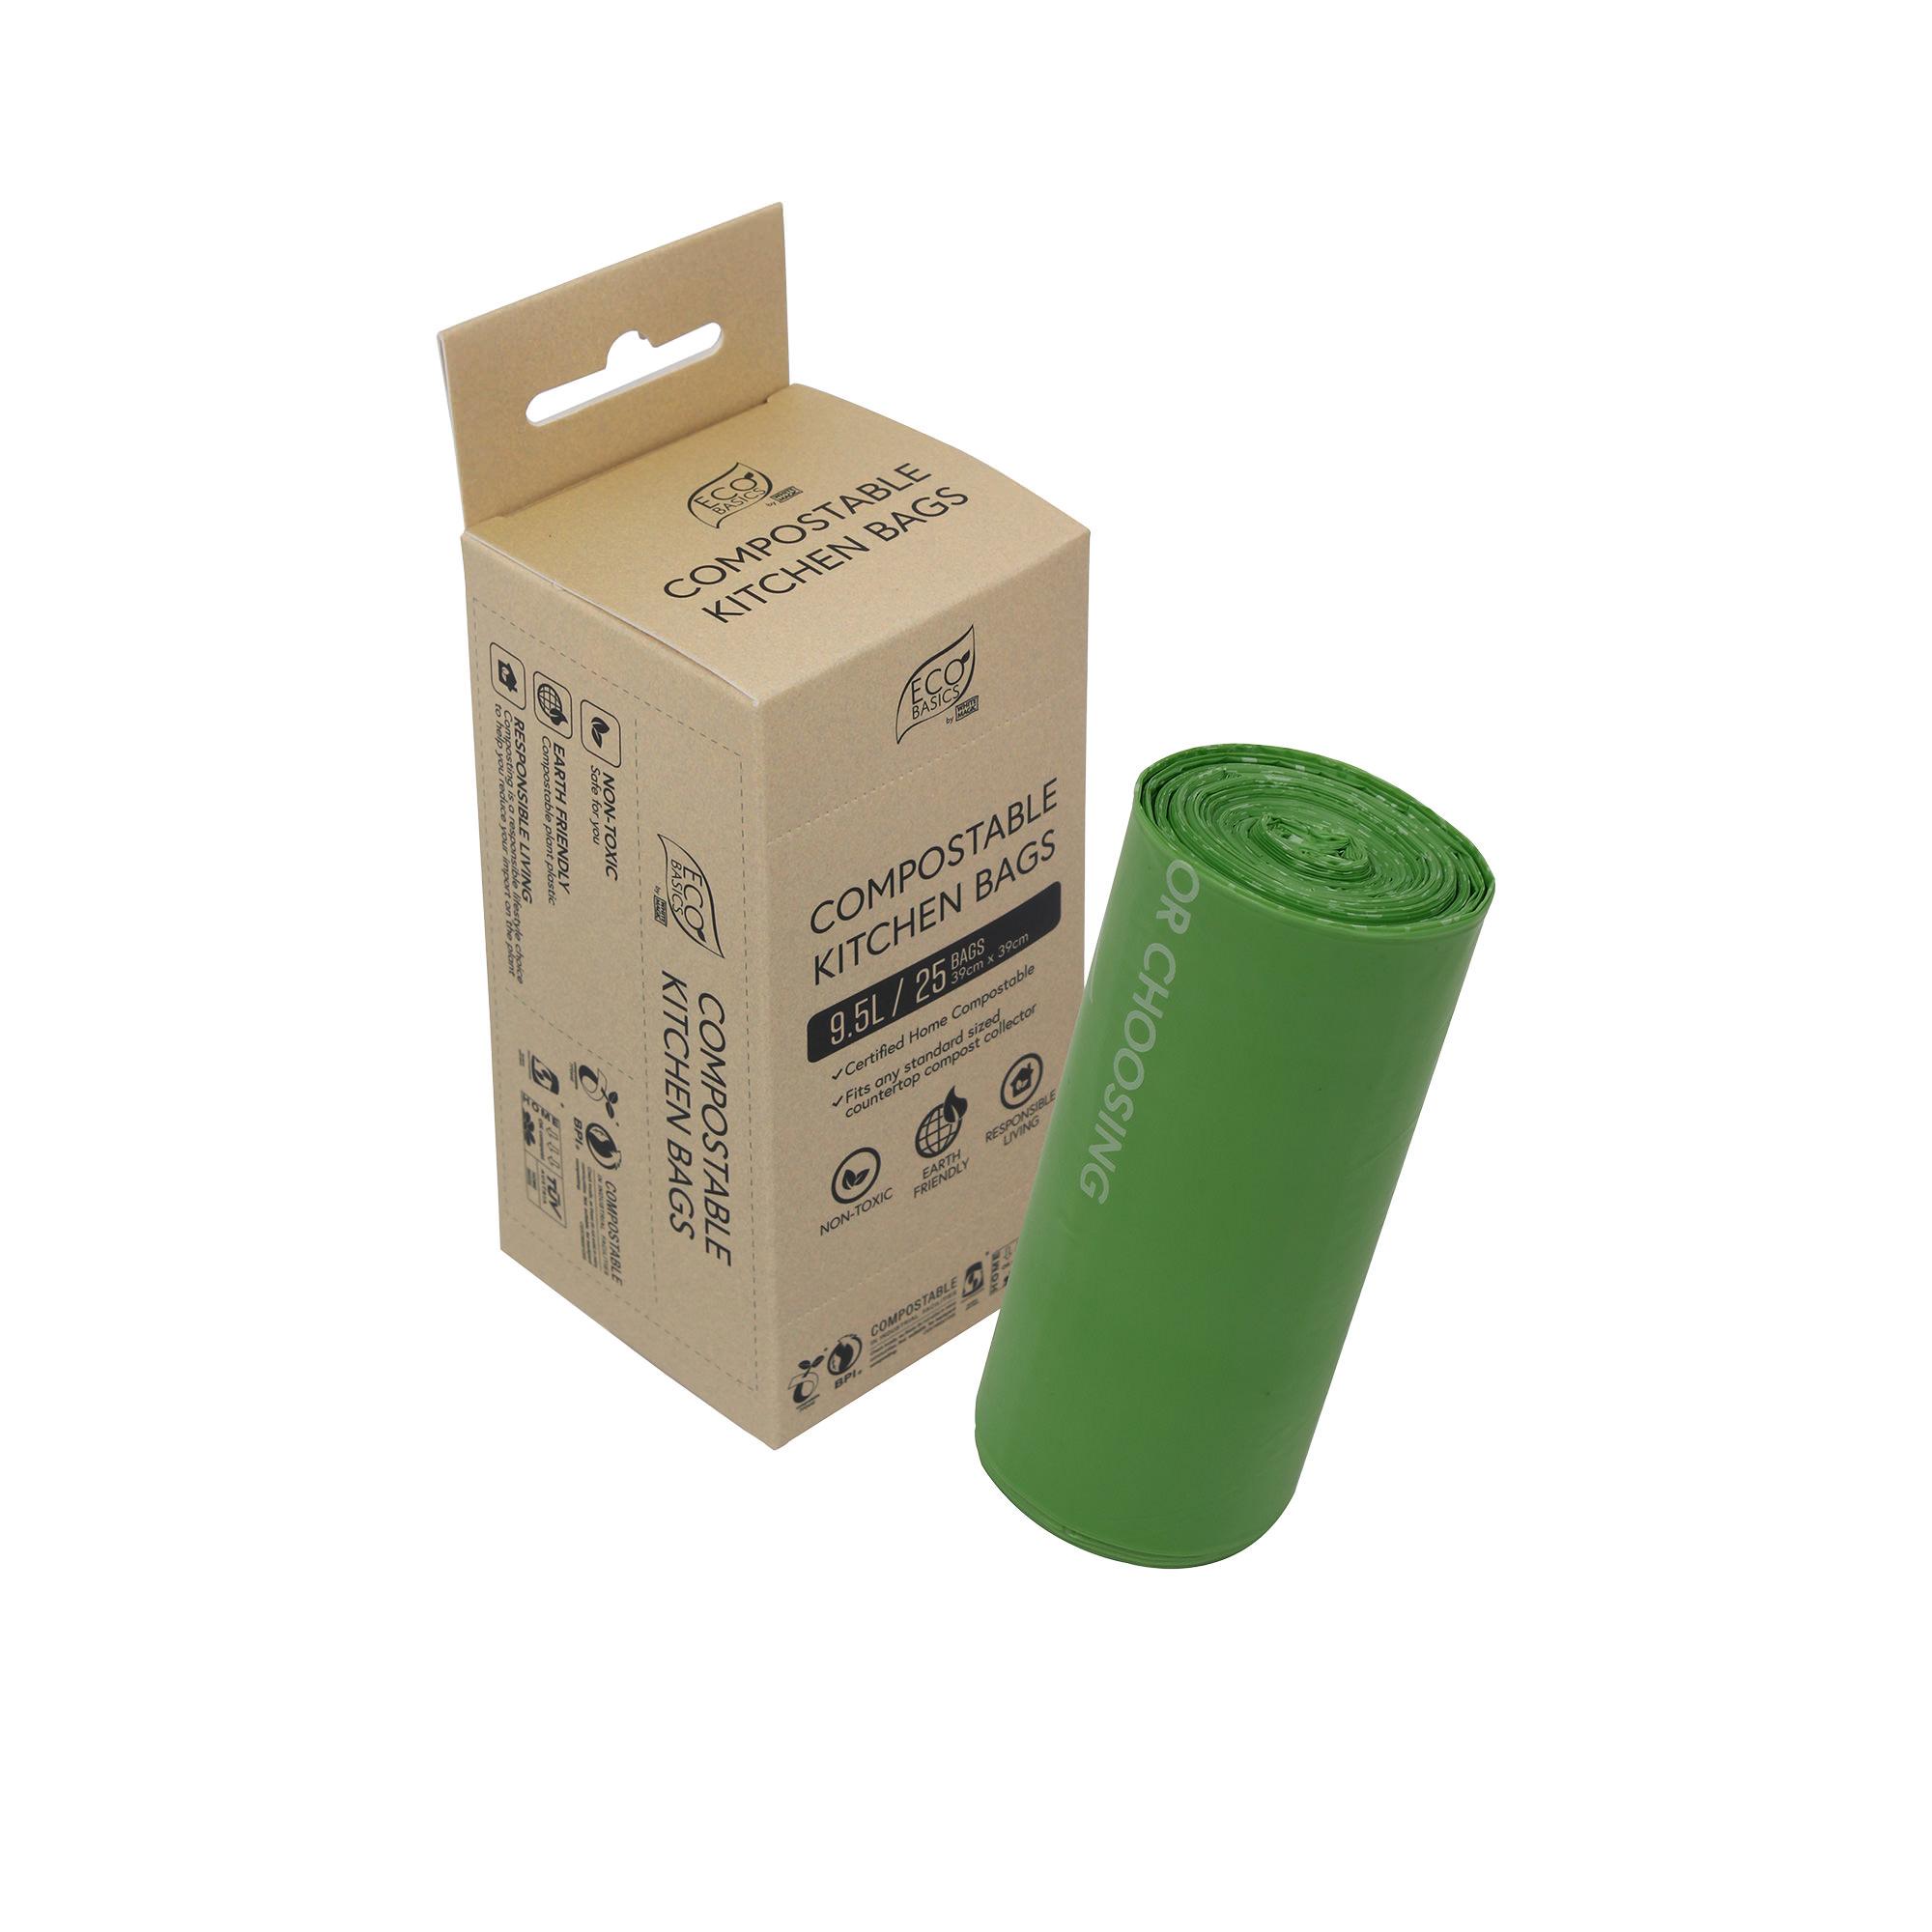 White Magic Eco Basics 25pk Compostable Kitchen Bags 9L